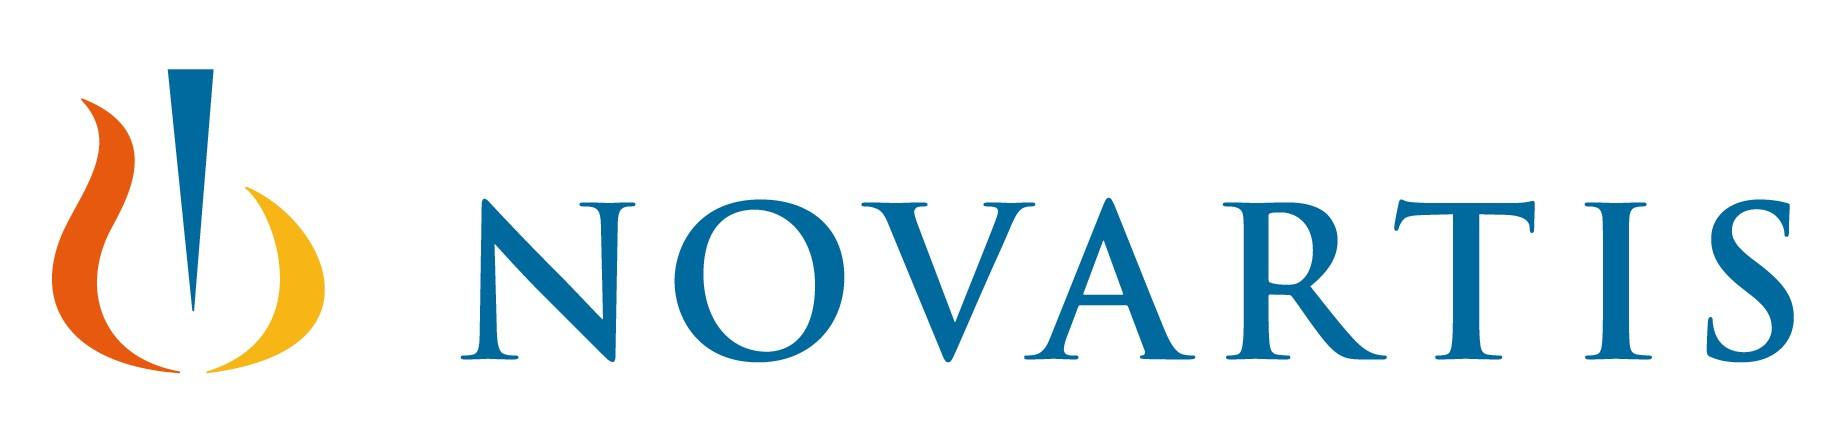 novartis-logo - Copy.jpg